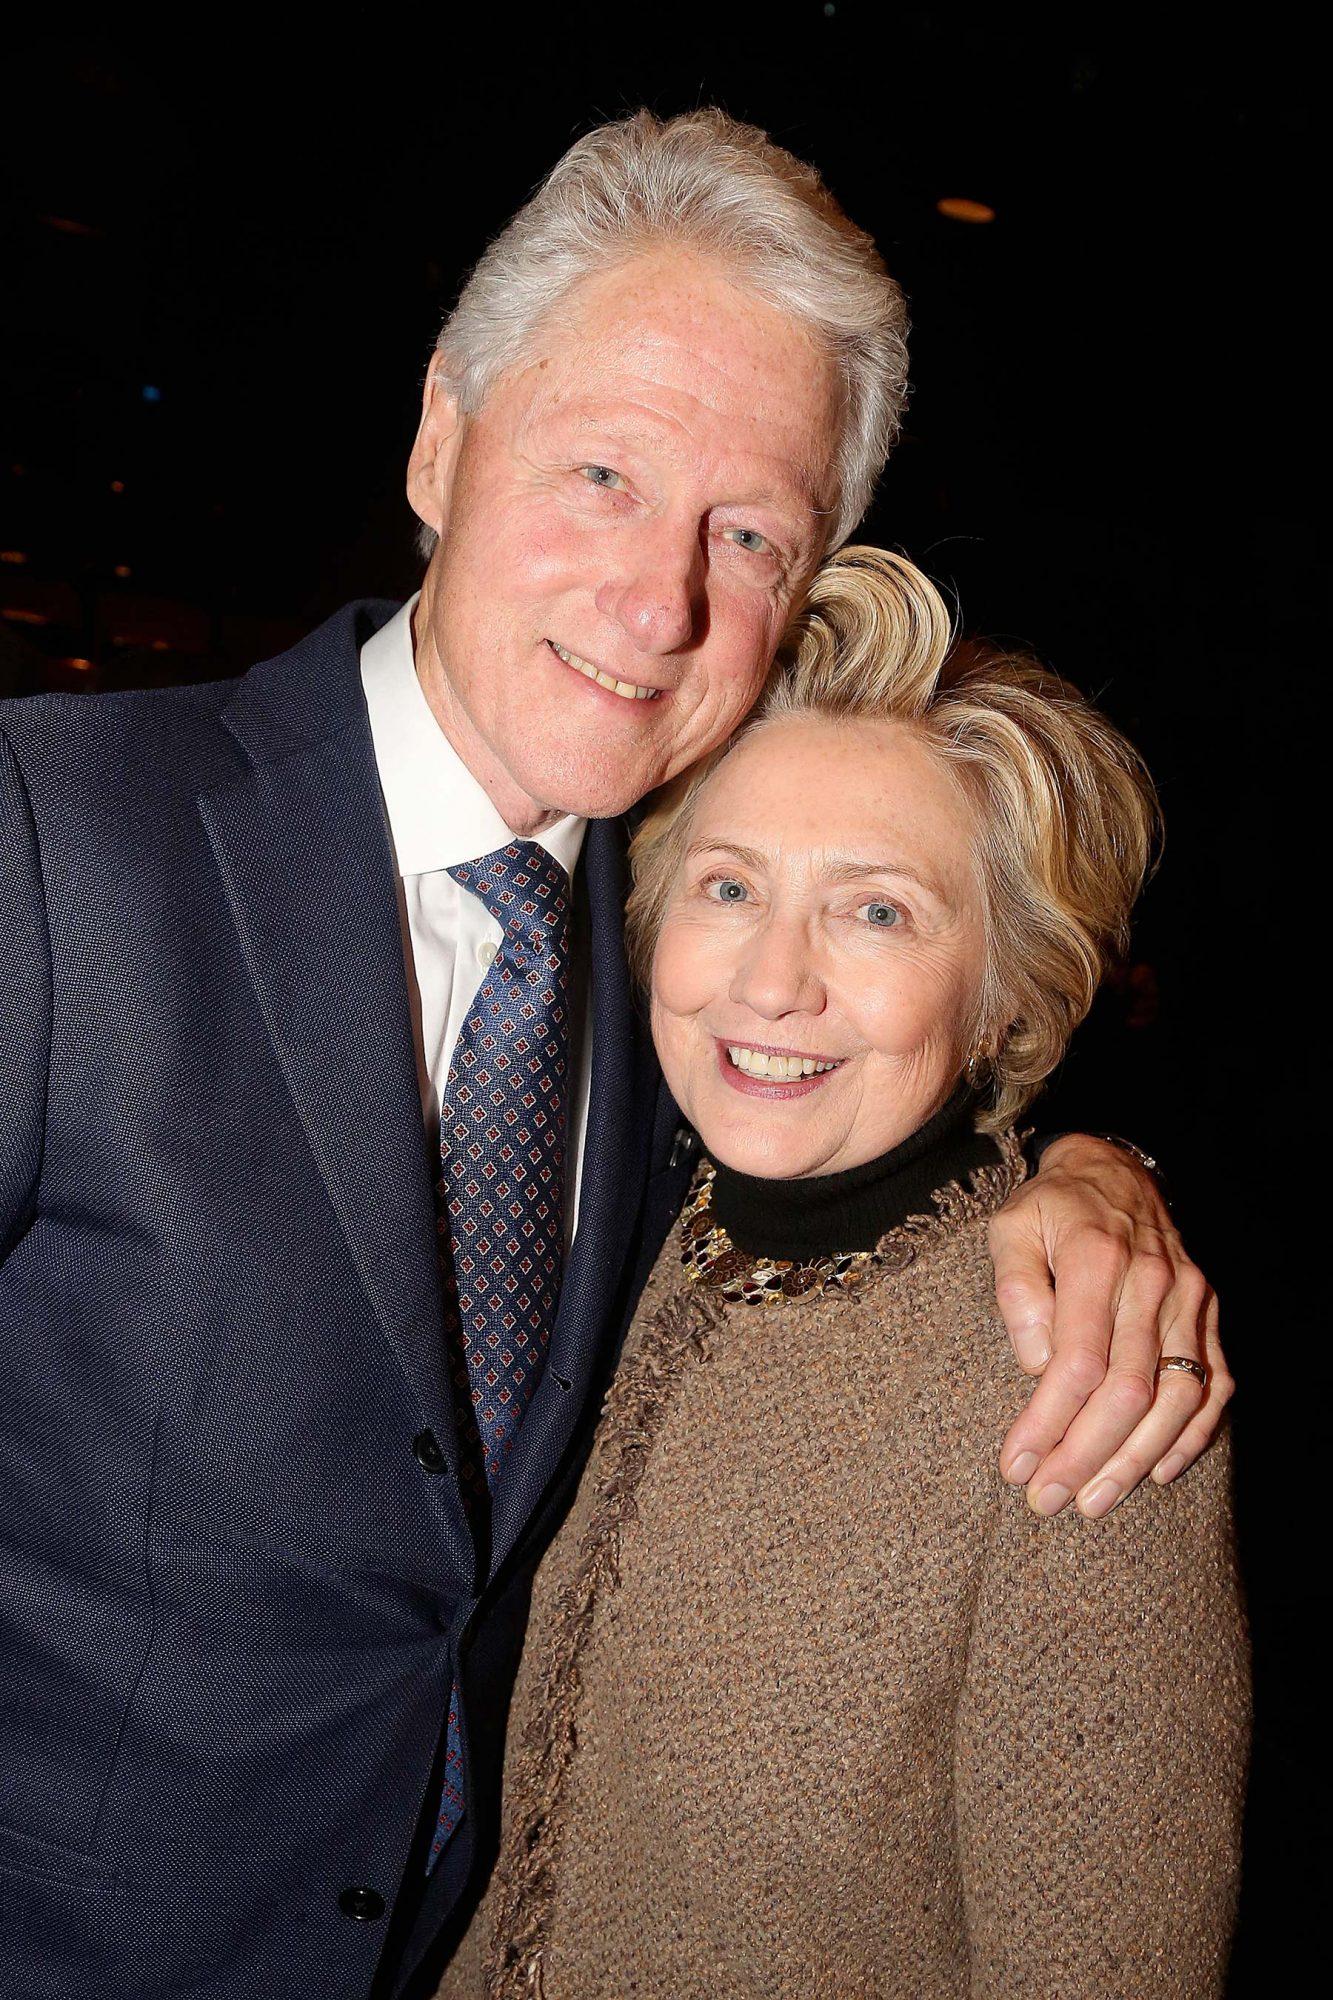 Hillary Clinton on Broaday